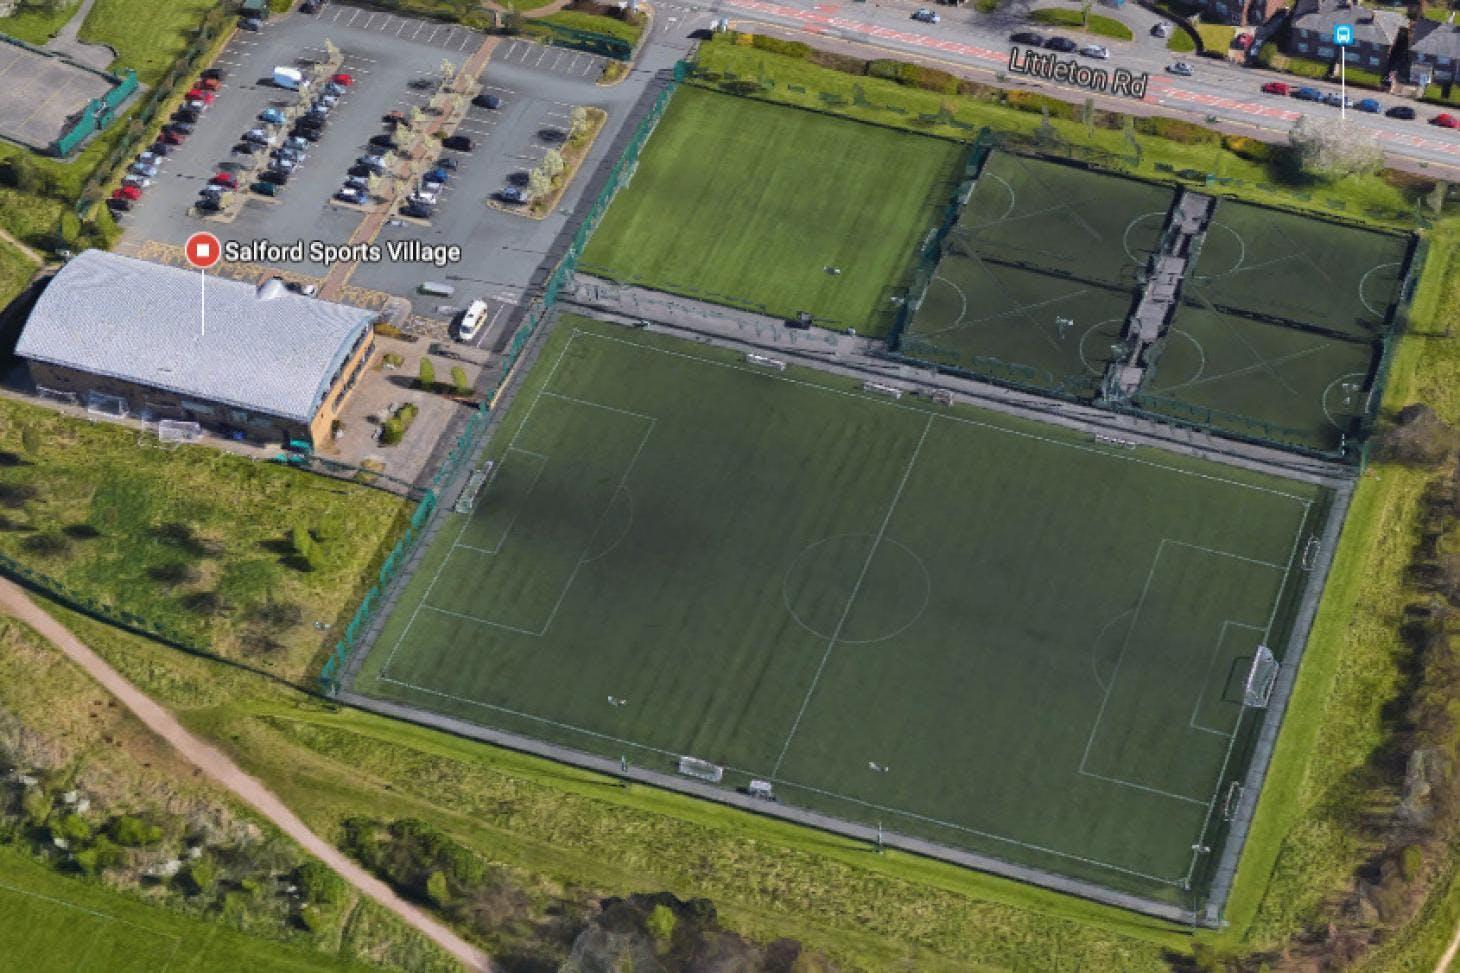 Salford Sports Village 7 a side | Grass football pitch